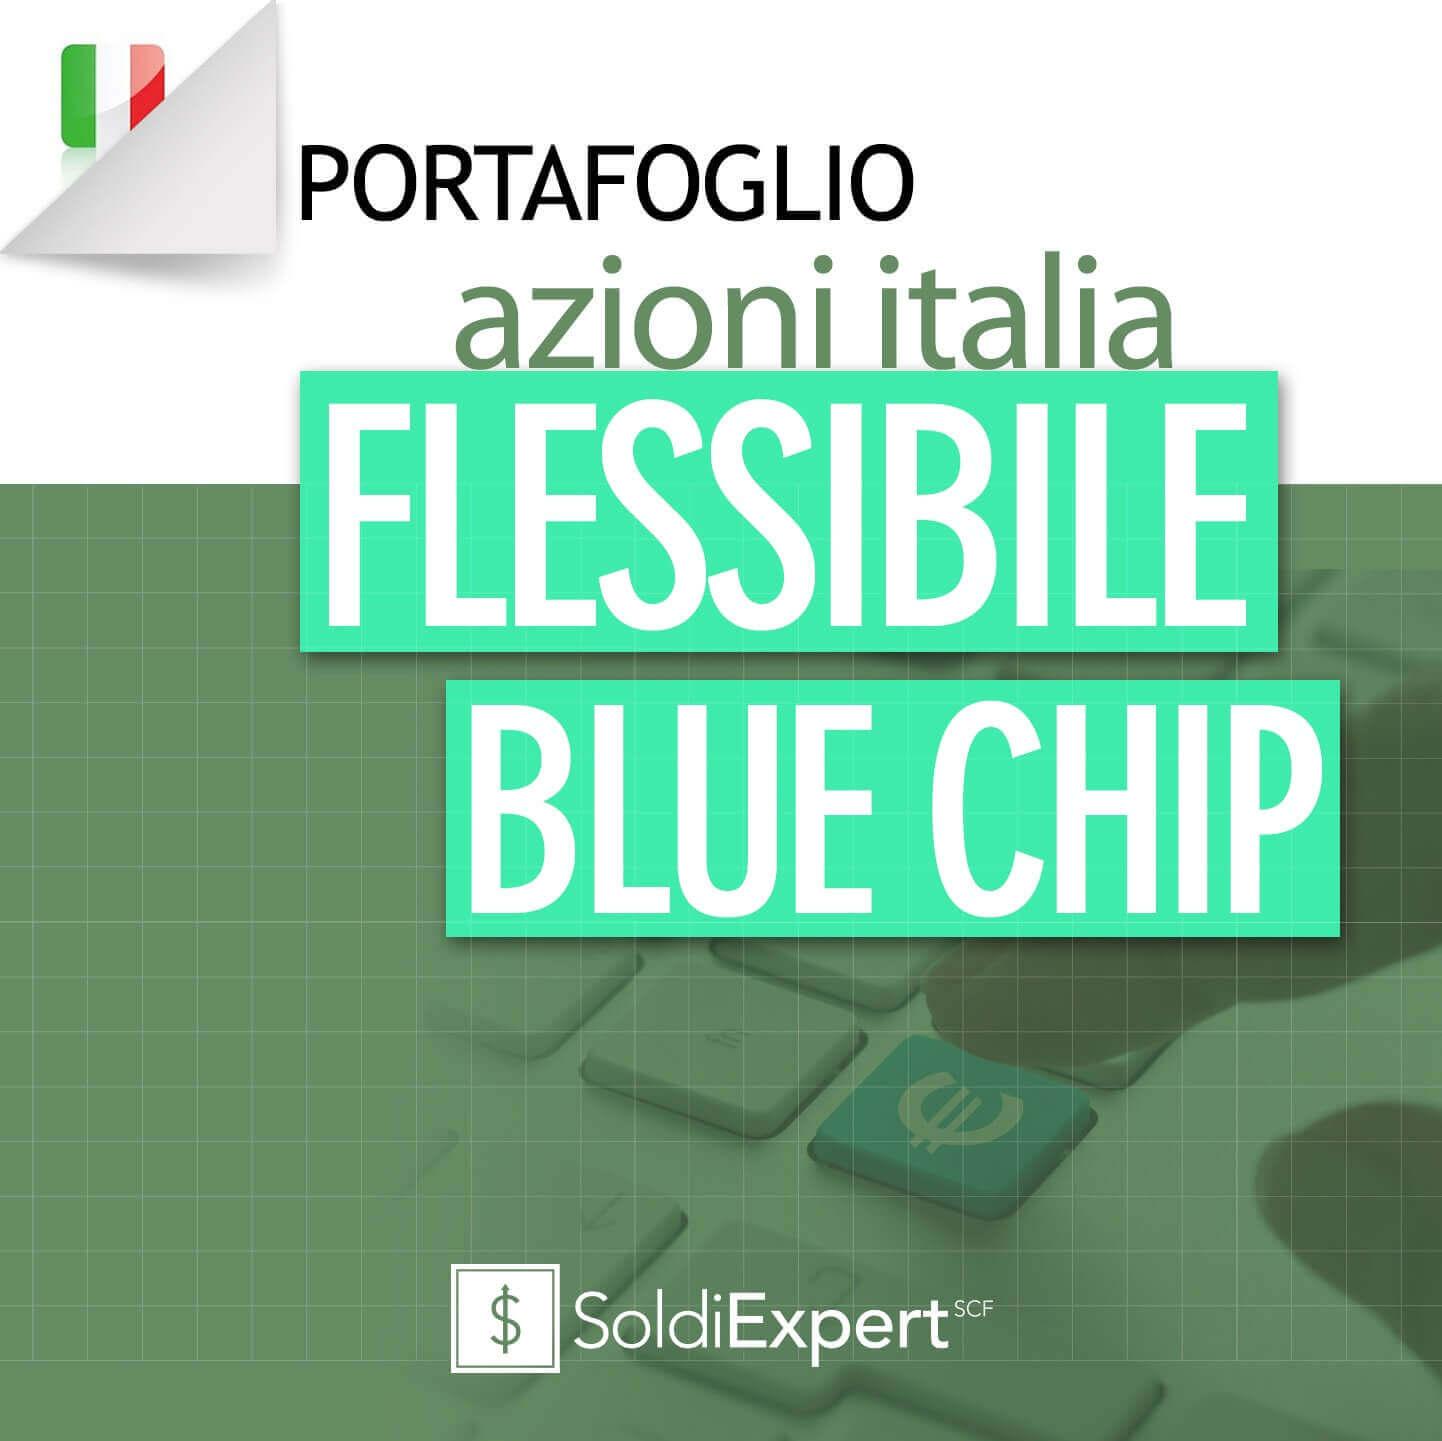 b714c22747 Flessibile Blue Chip | SoldiExpert SCF